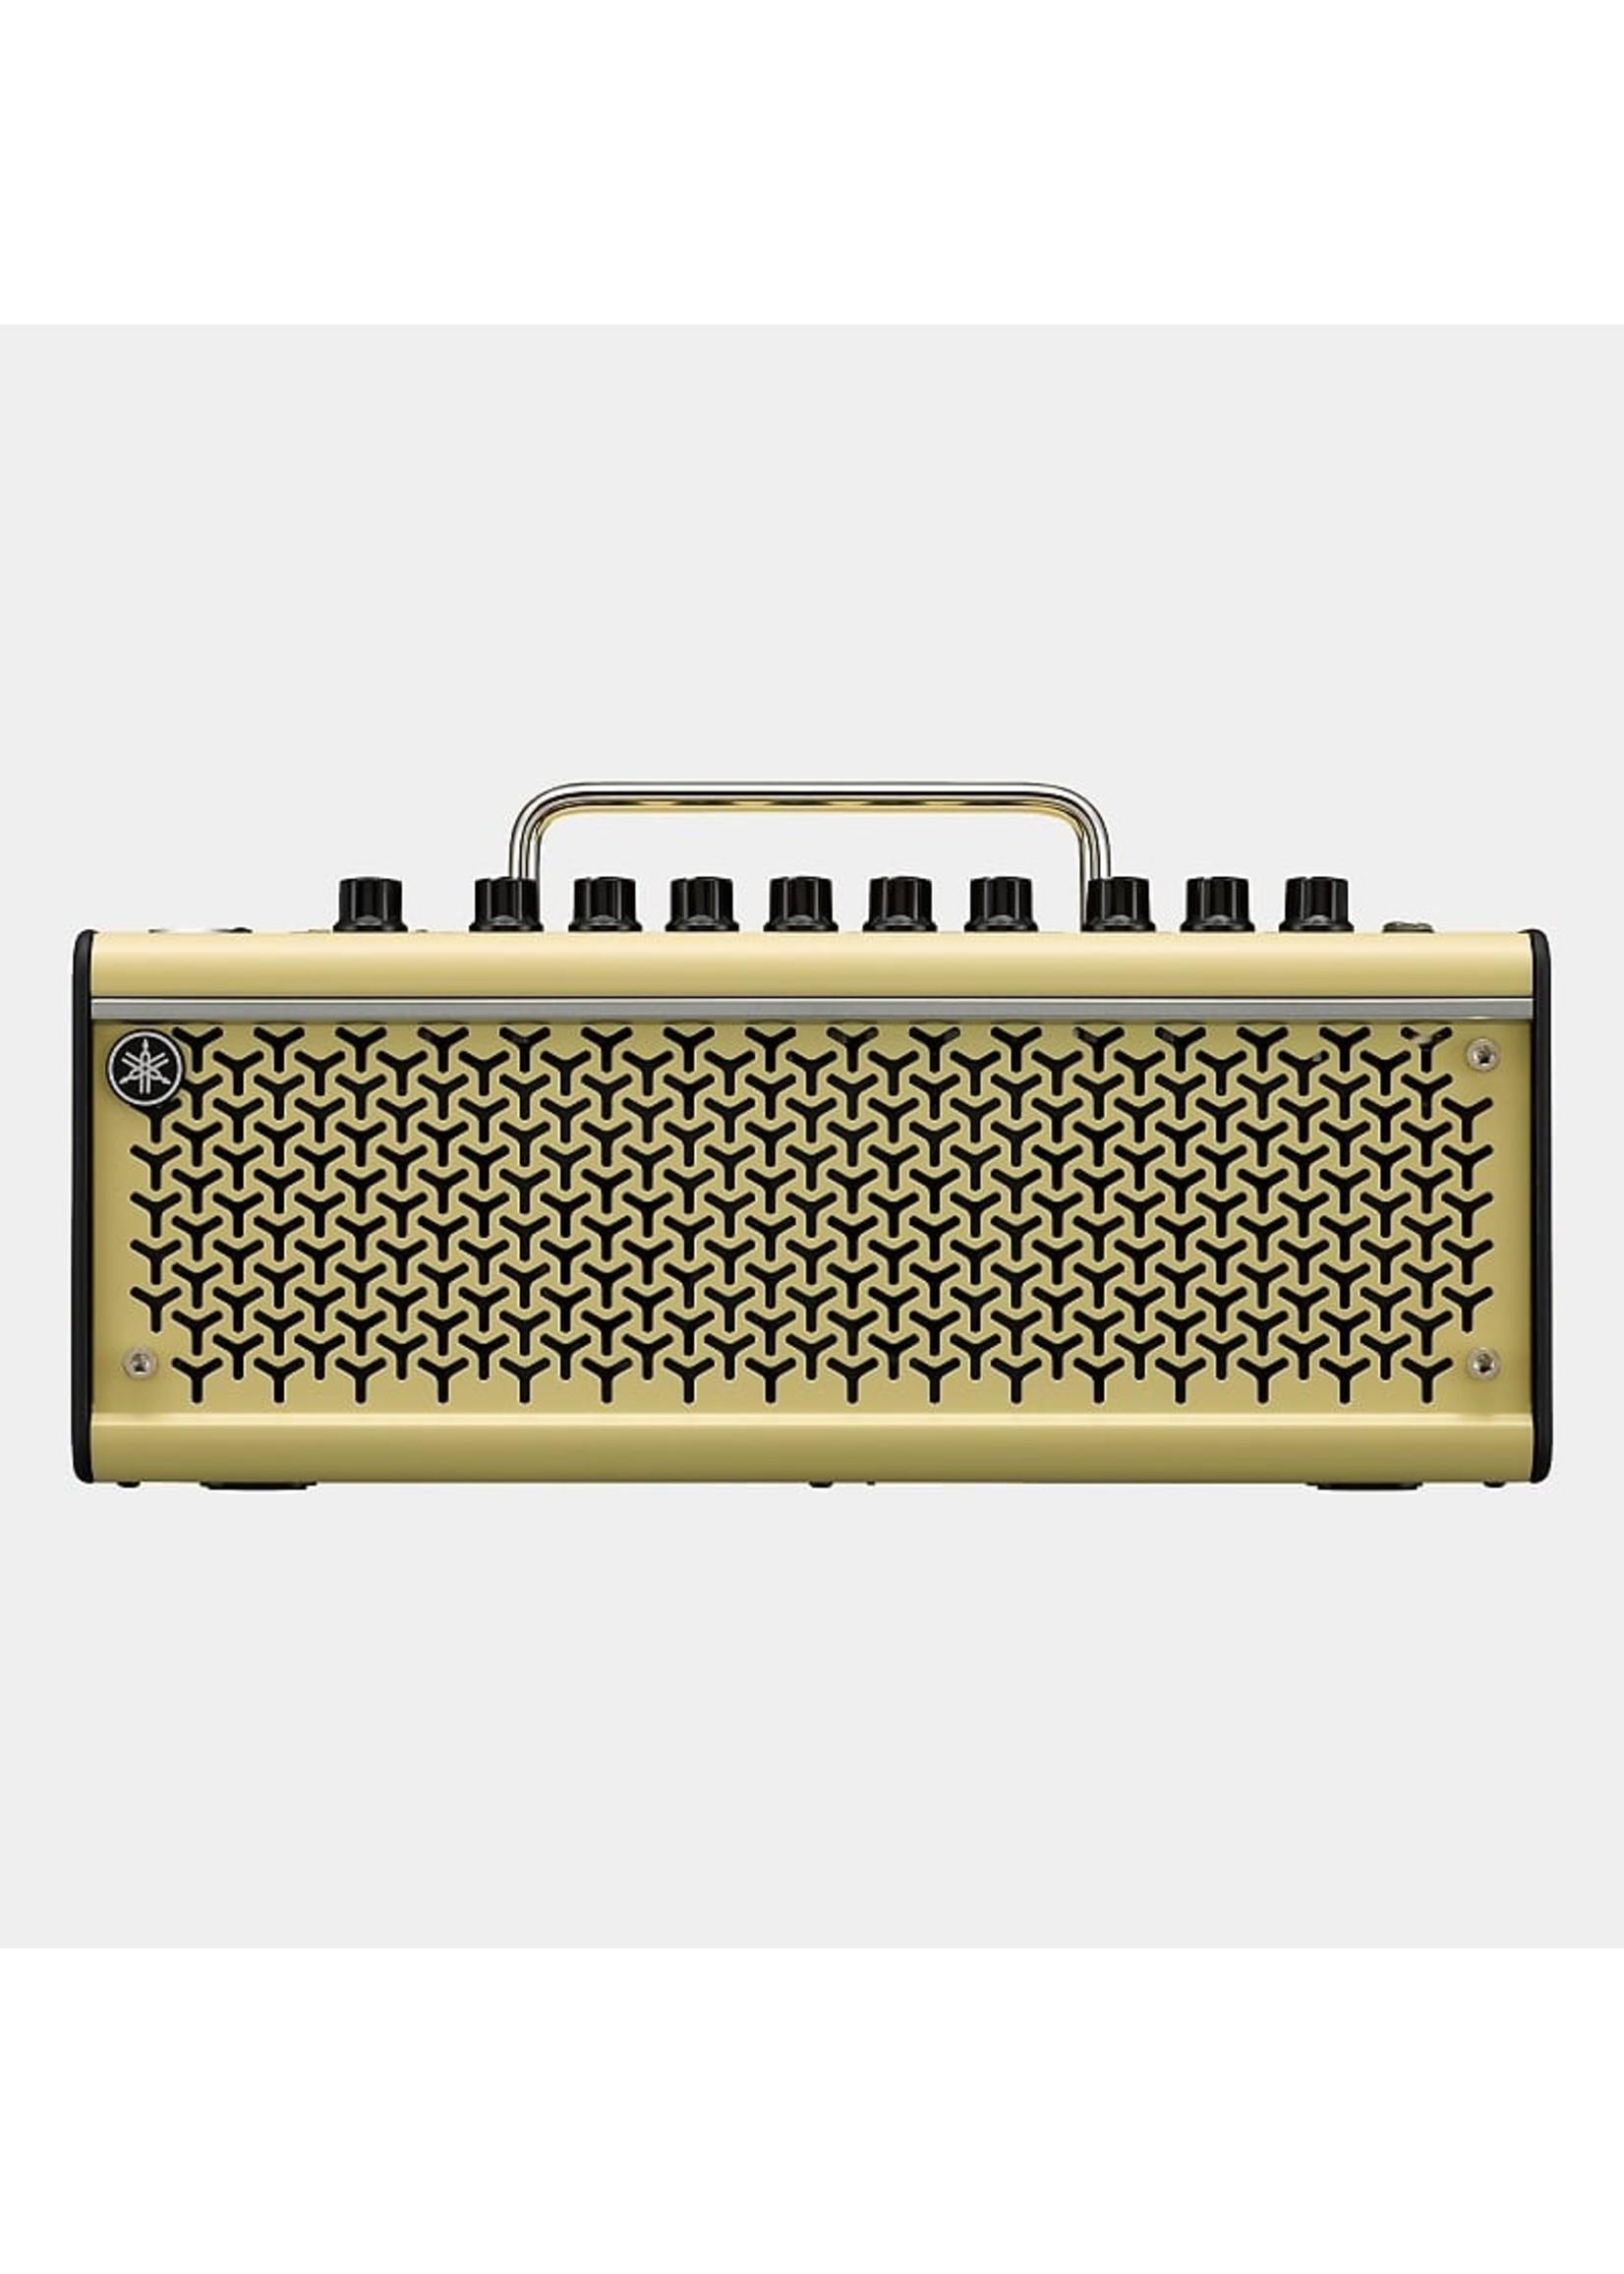 Yamaha Yamaha THR10 II Wireless Guitar Amplifier